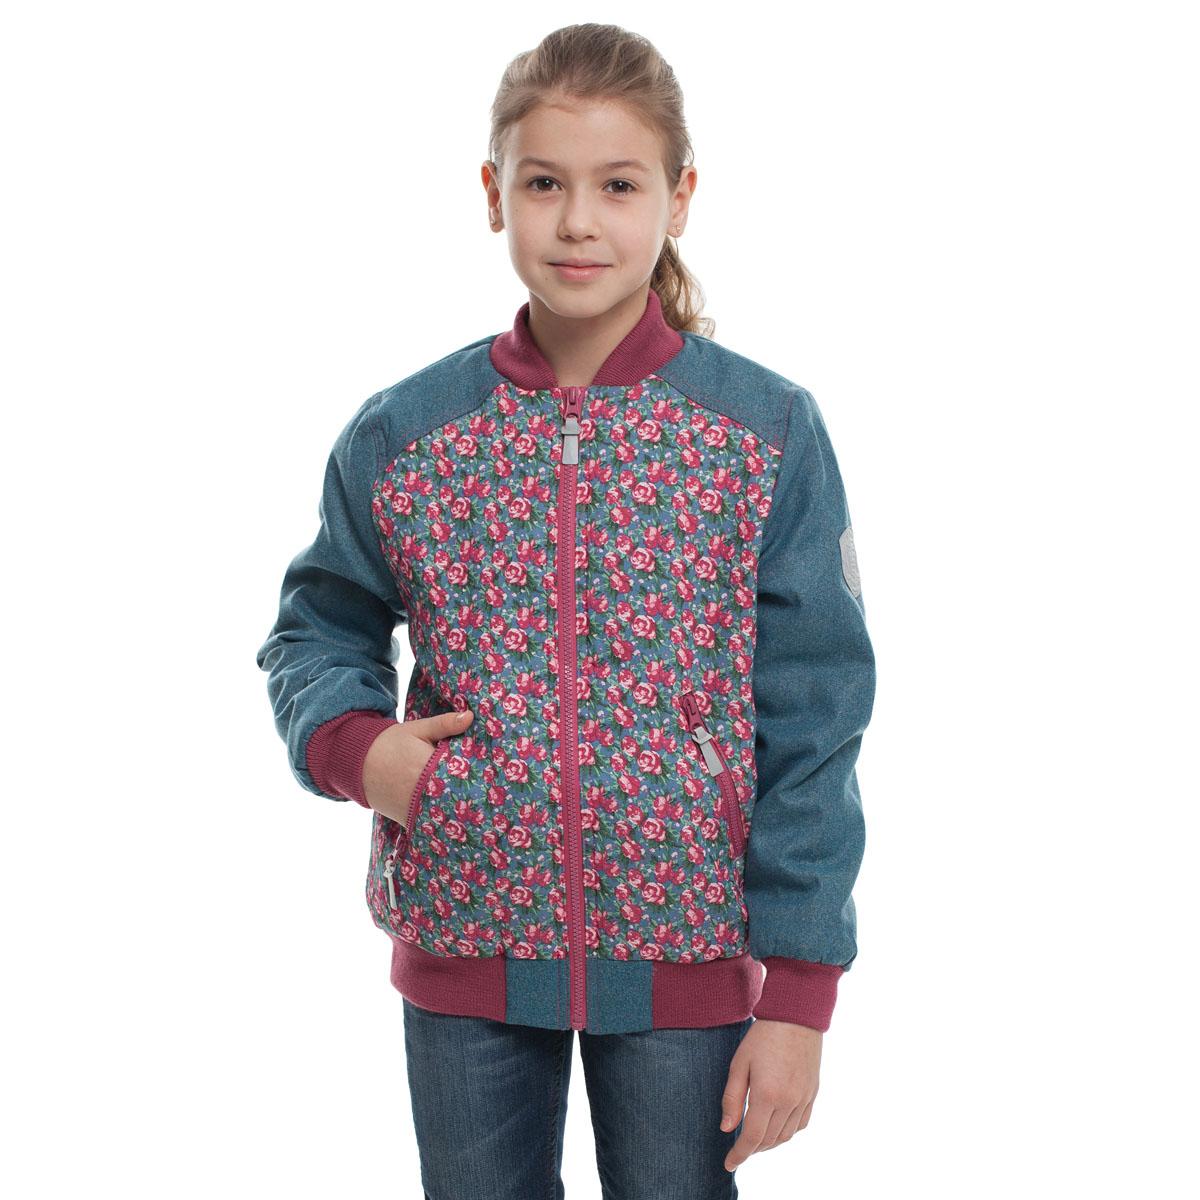 Фото - Куртка демисезонная, Карина jumper 1234 свитер